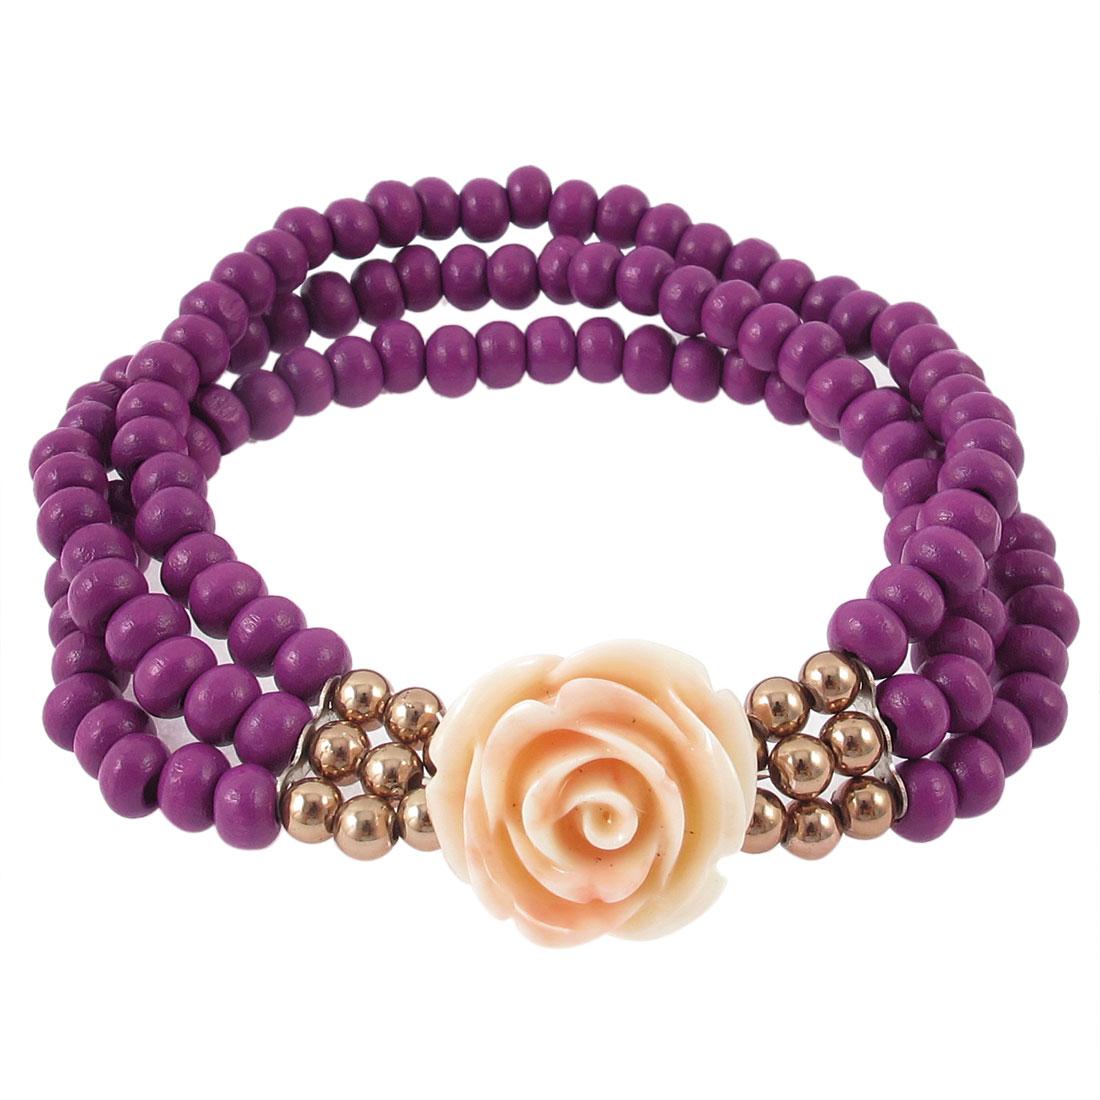 Lady Flower Pendant Round Beads Decoration Stretchy Wrist Bracelet Bangle Purple